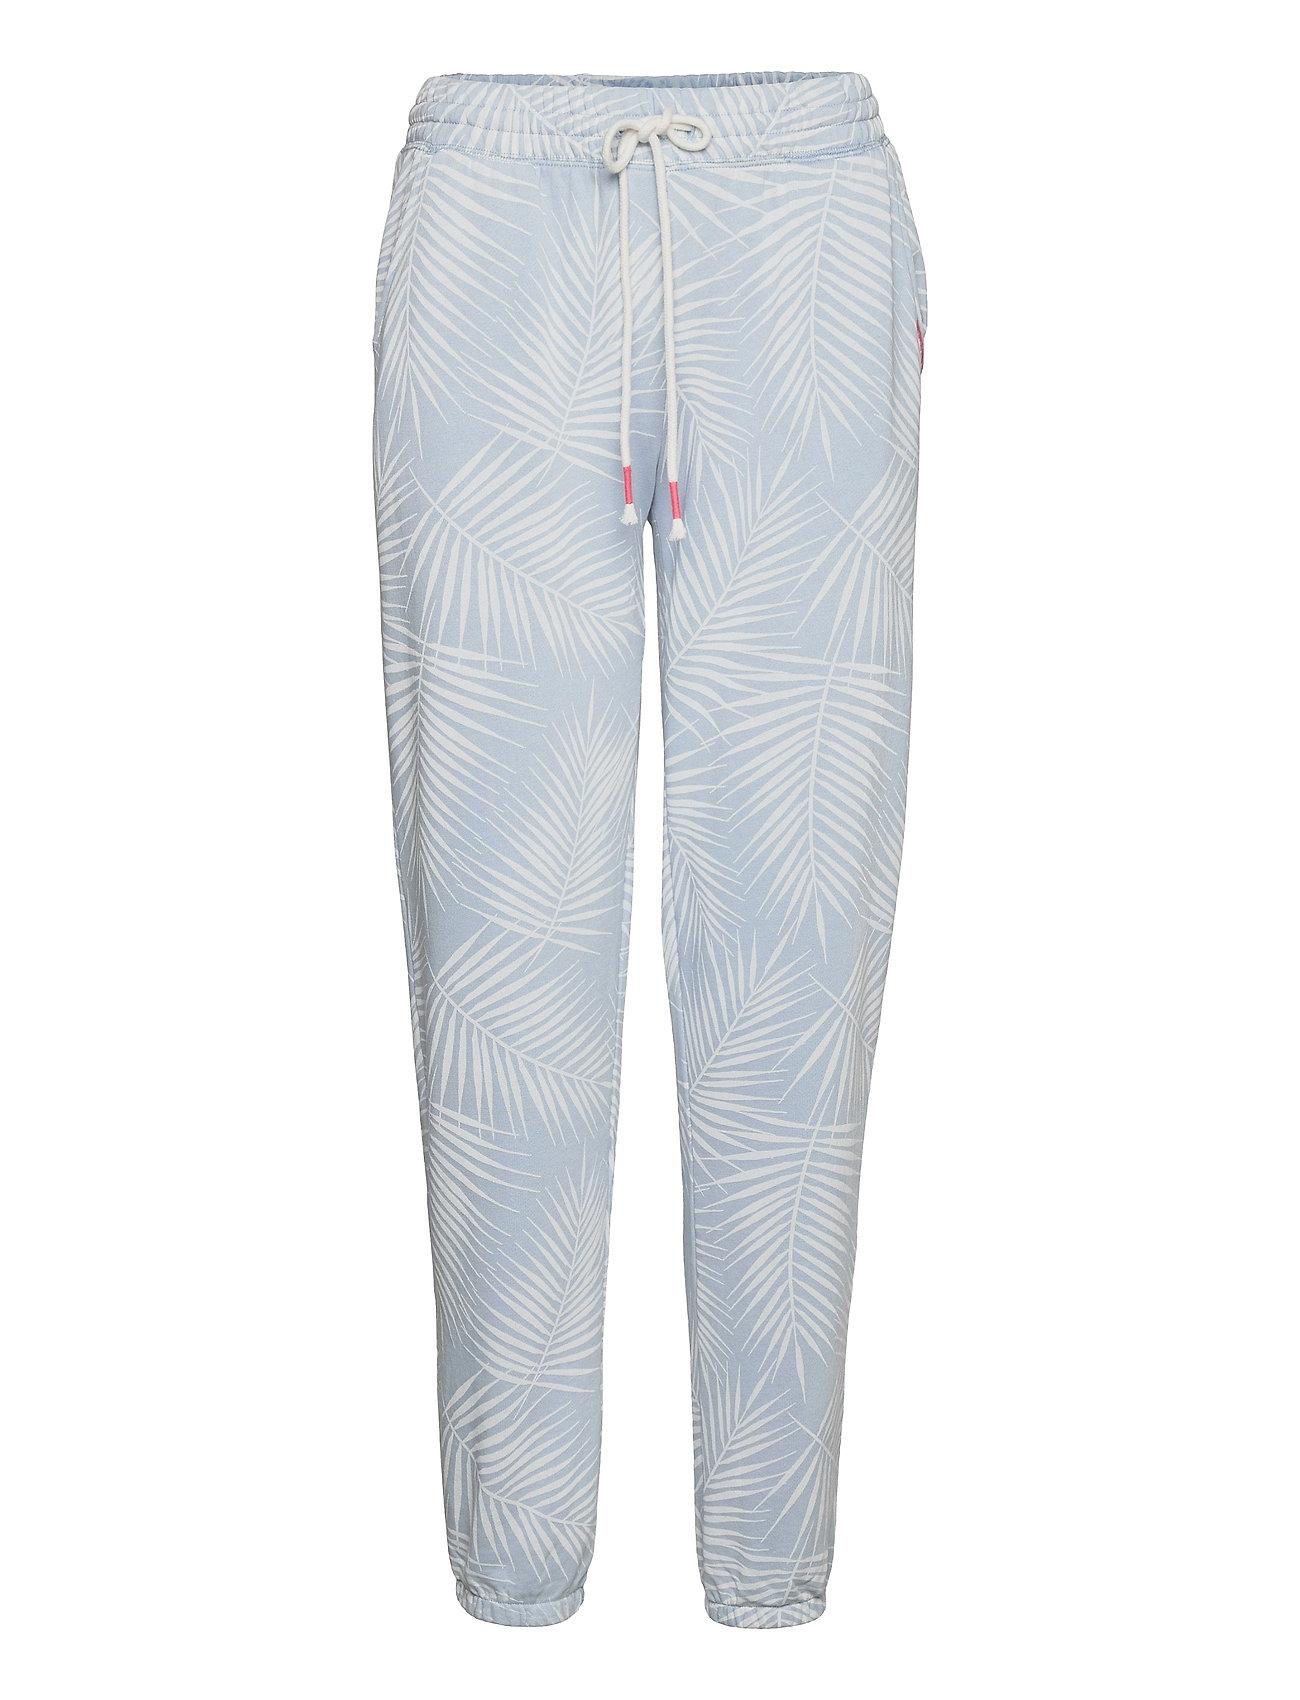 Pant Pyjamasbukser Hyggebukser Blå PJ Salvage